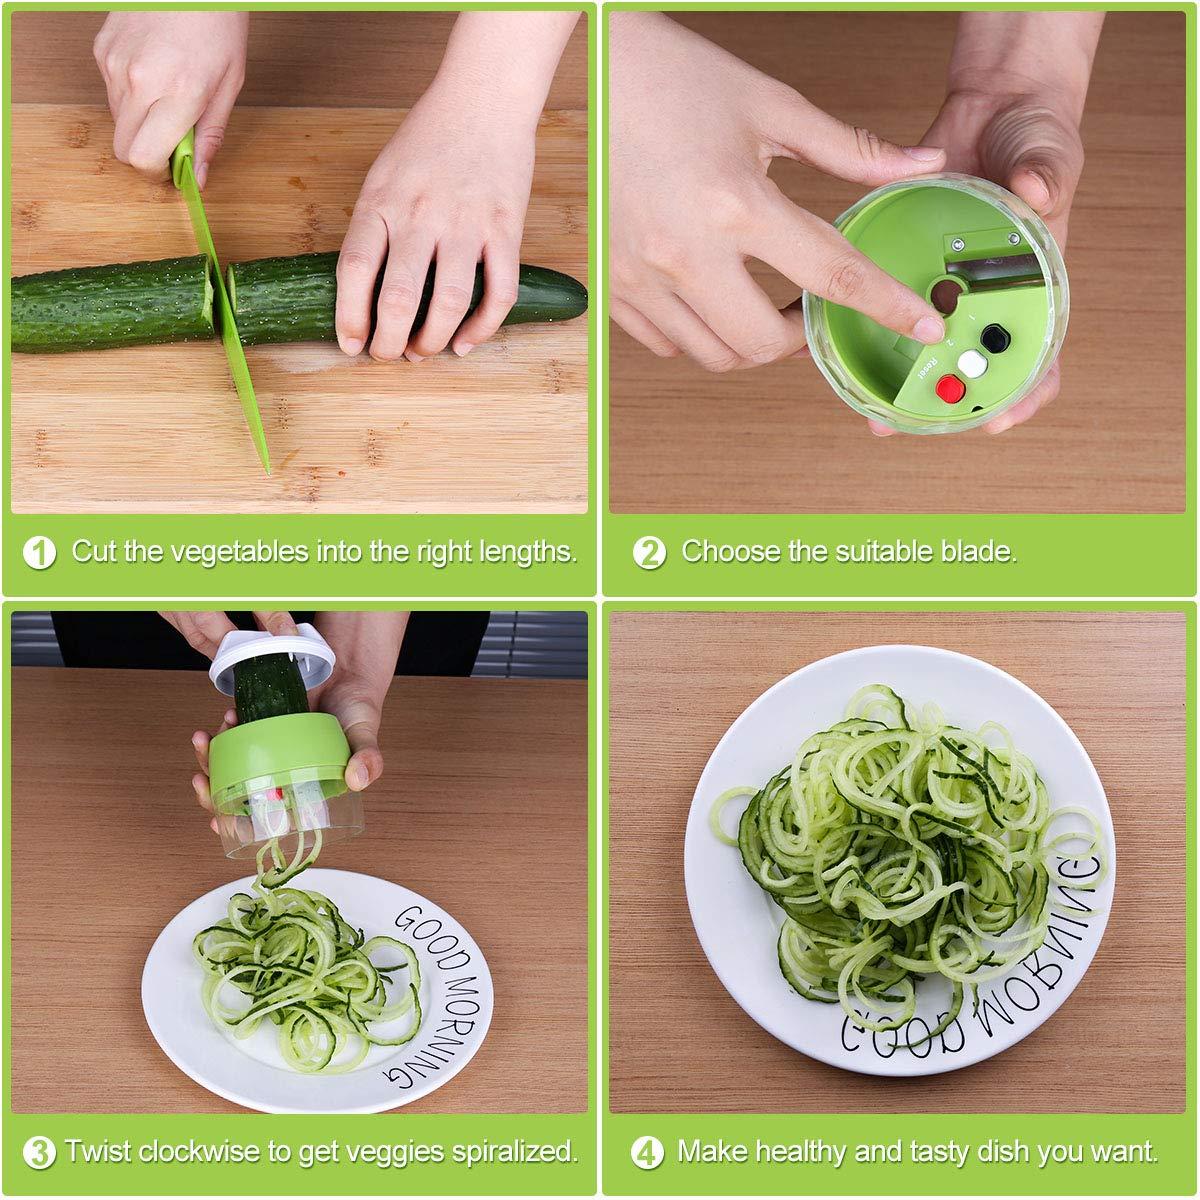 Vegetable Spiralizer ACTOPP Spiral Slicer Green Vegetable Cutter Small and Lightweight Hand Held Spiralizer Creats Continuous Noodles for Zucchini Cucumber Carrot Pumpkin (Green)